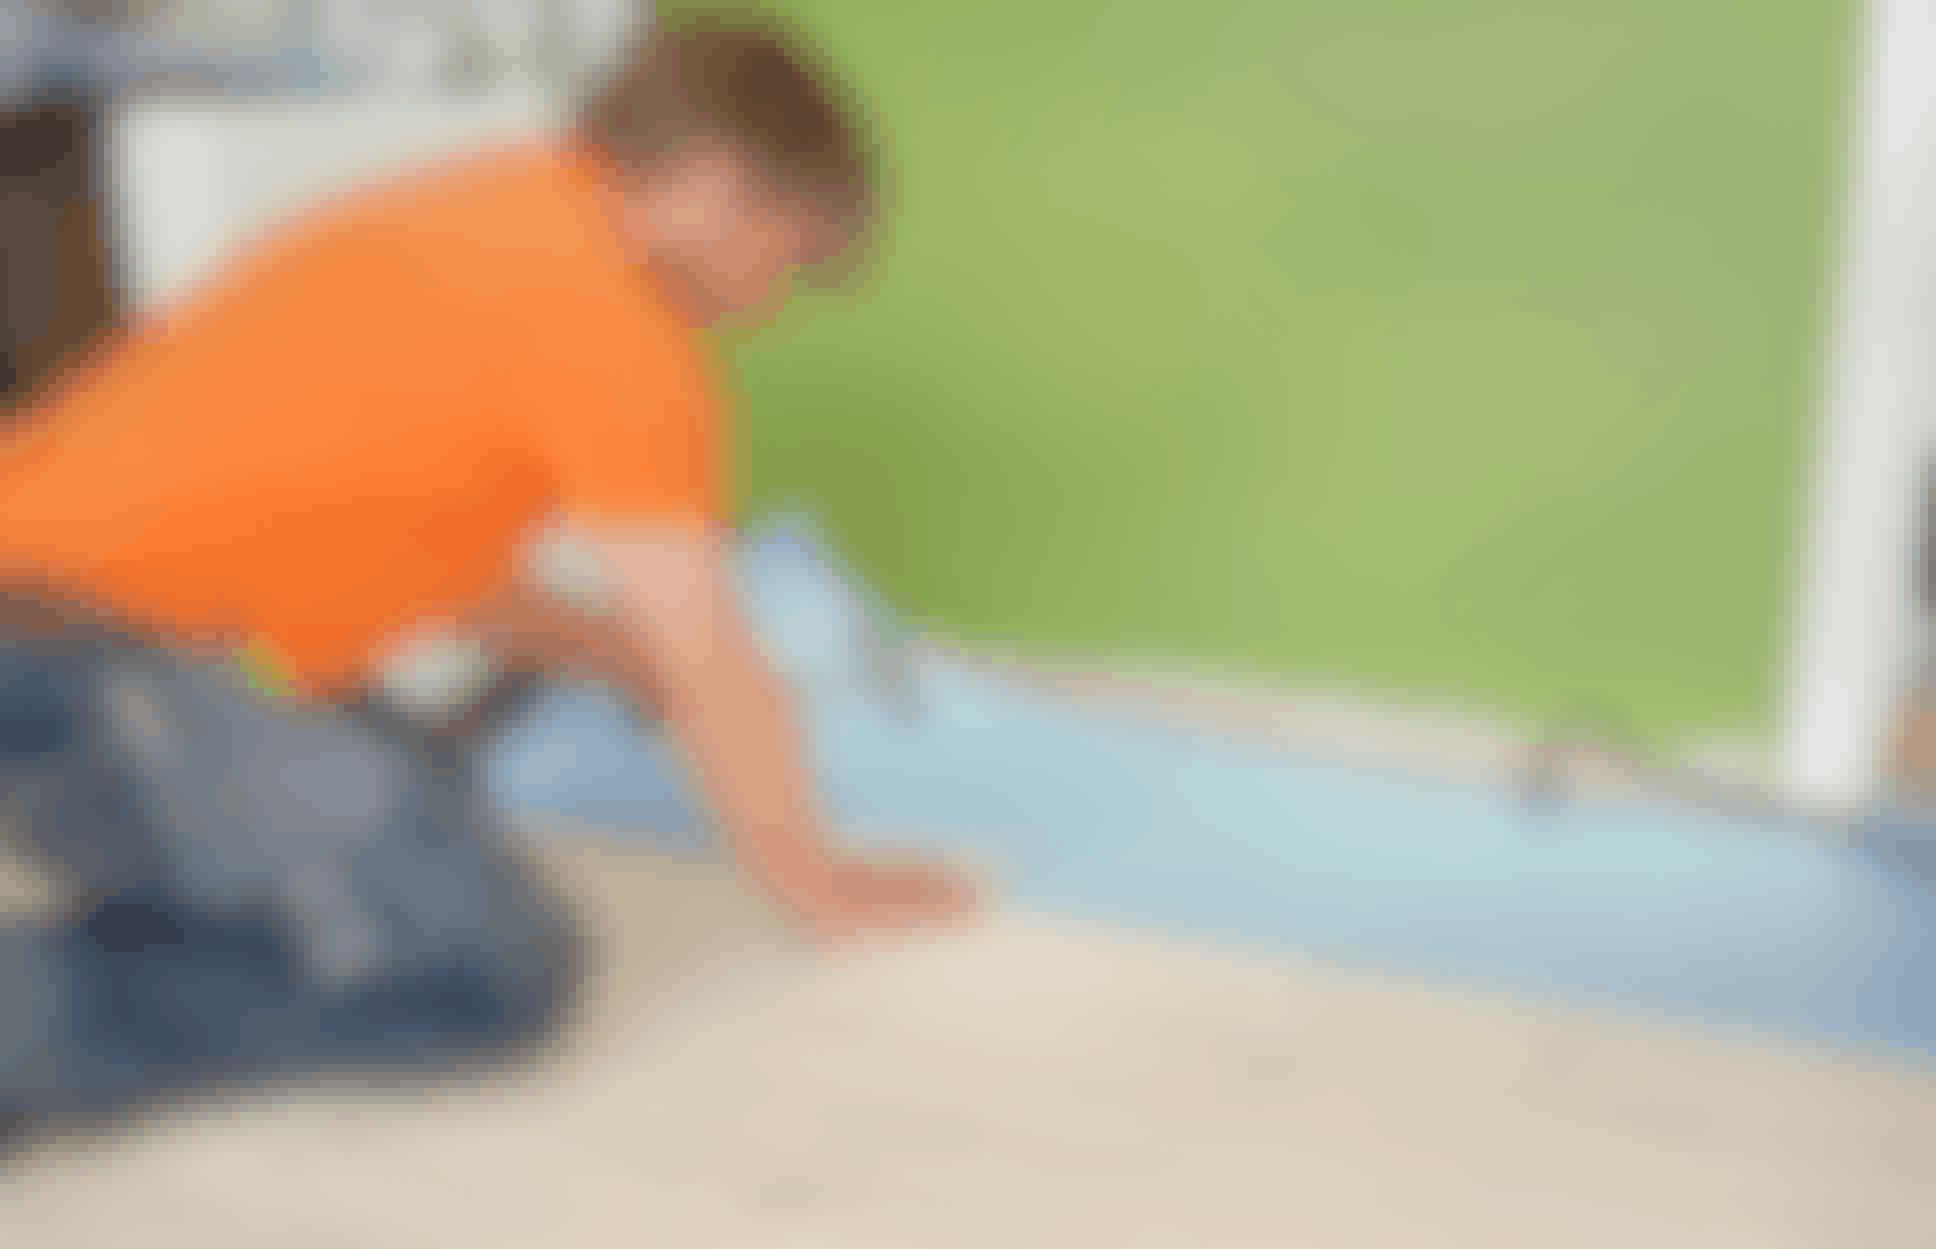 Varm beton under plankegulvet